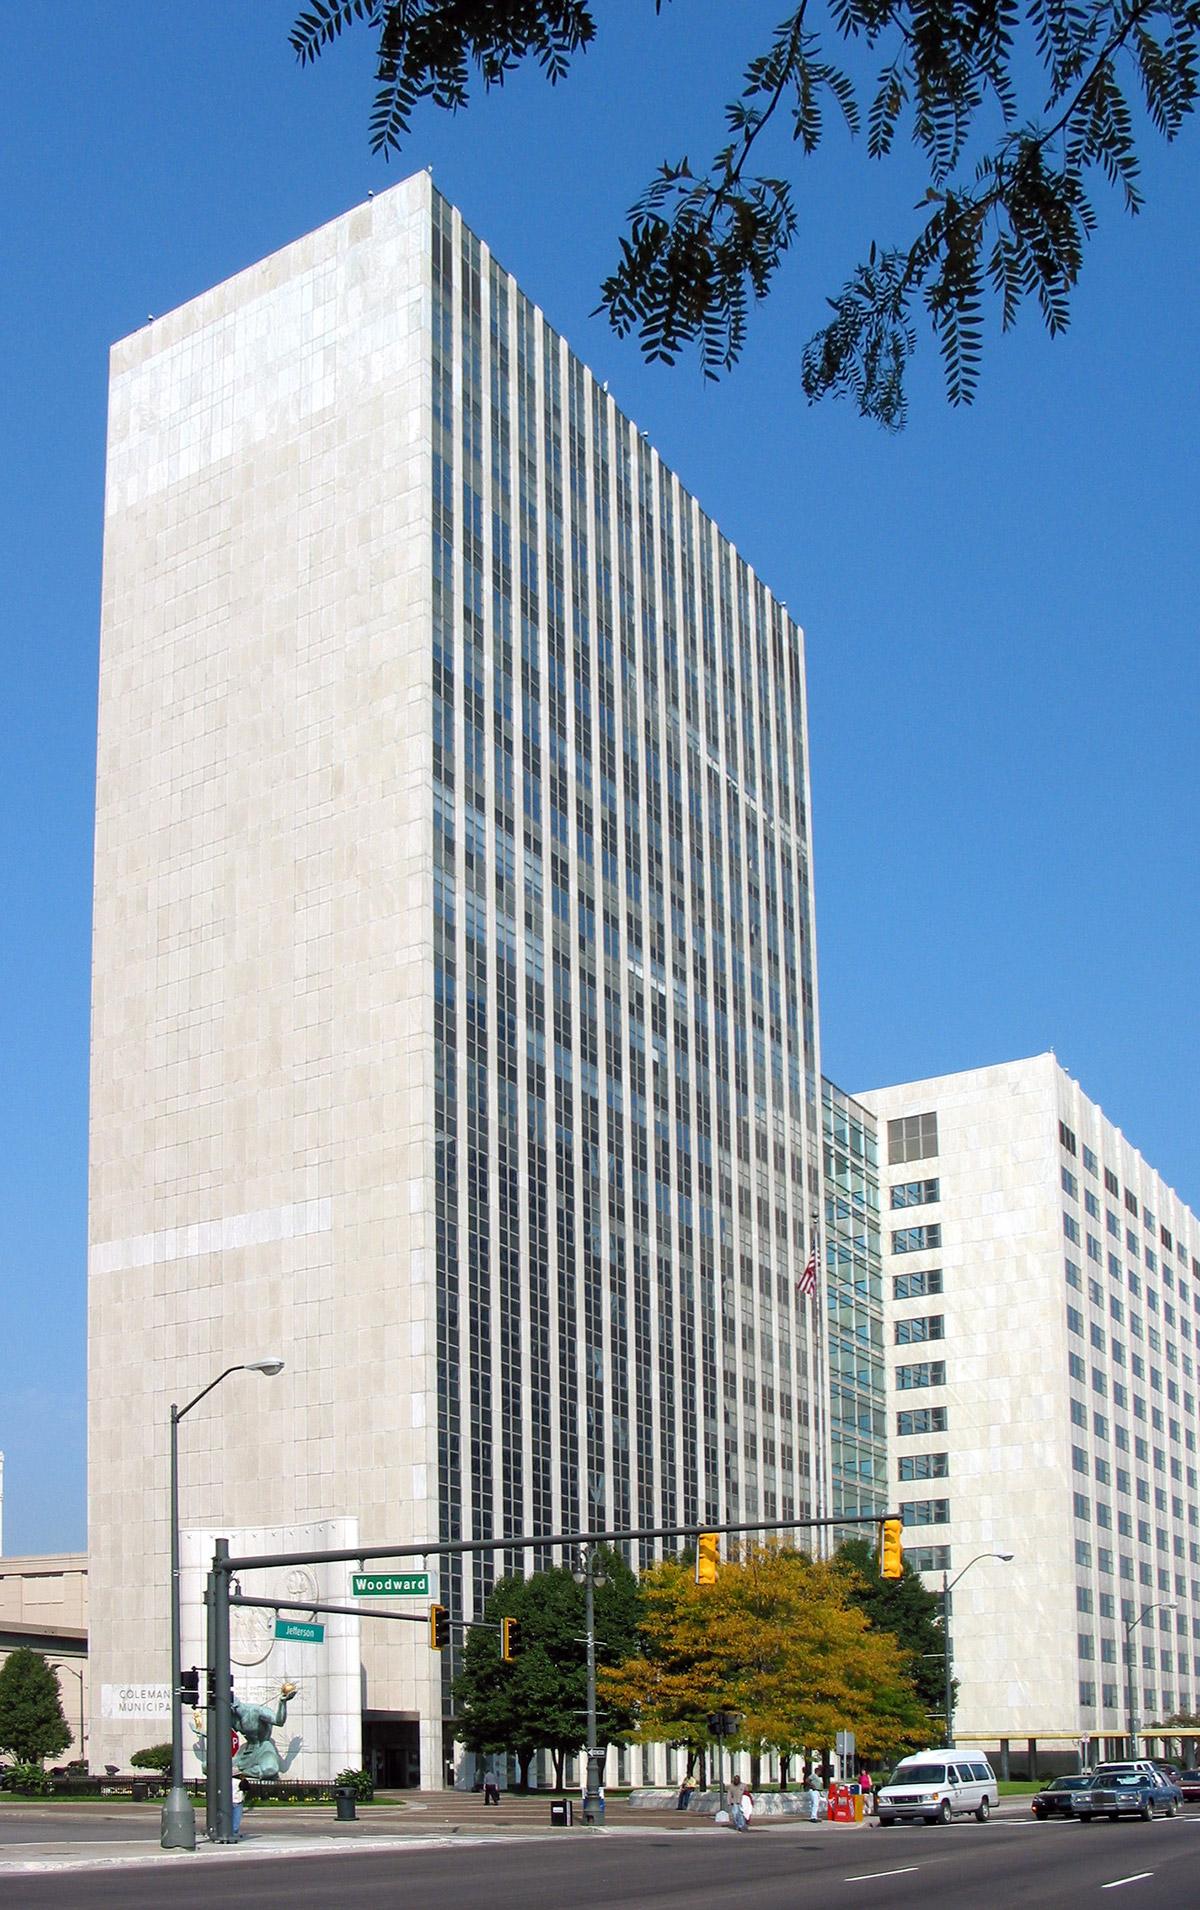 Coleman A. Young Municipal Building